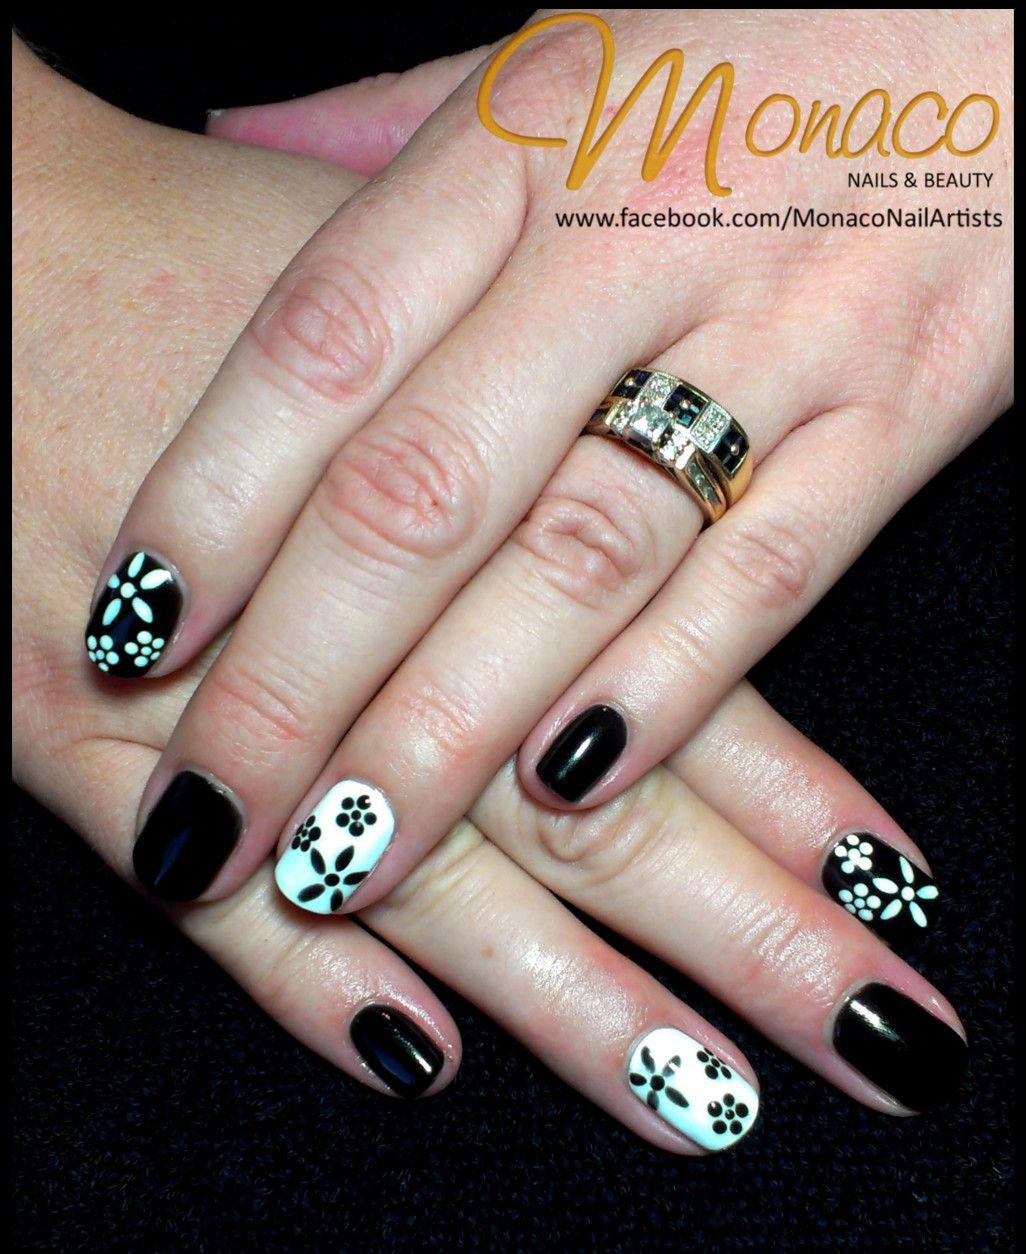 Alanas AWESOME Black and White Nails! NailsByMonaco